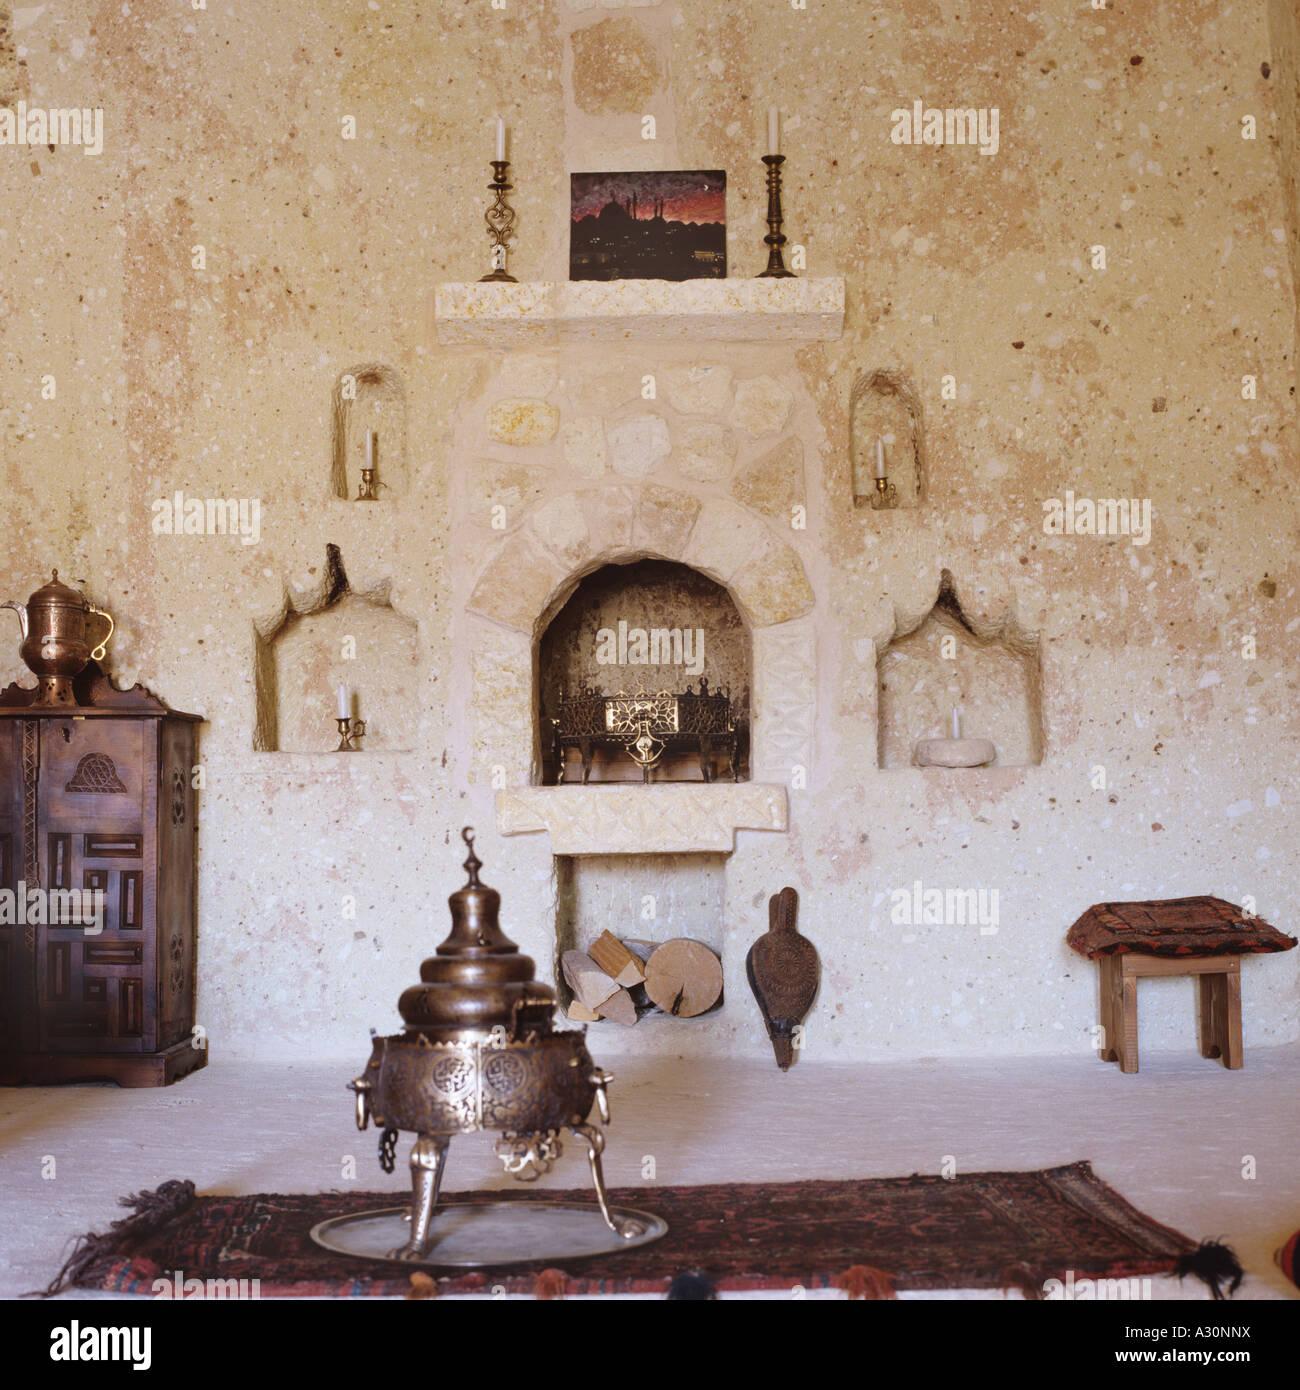 Turkish Living Room Interior With Samovar And Stone Alcove